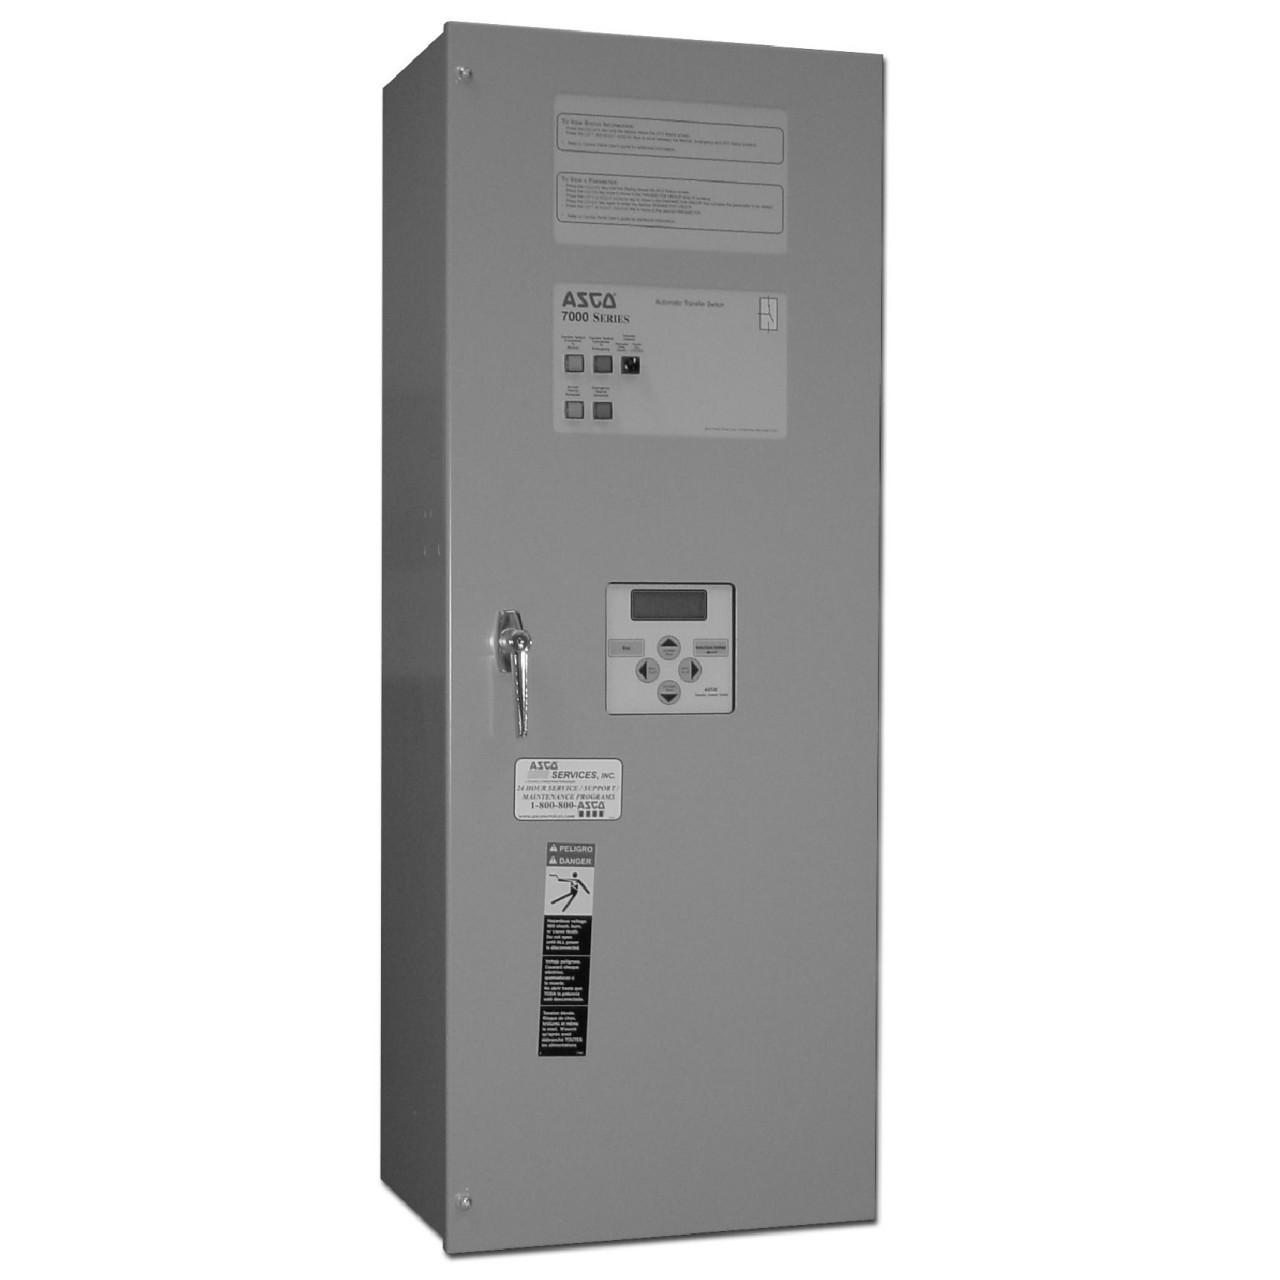 Asco 7000 Auto Transfer Switch (3Ph, 30A)